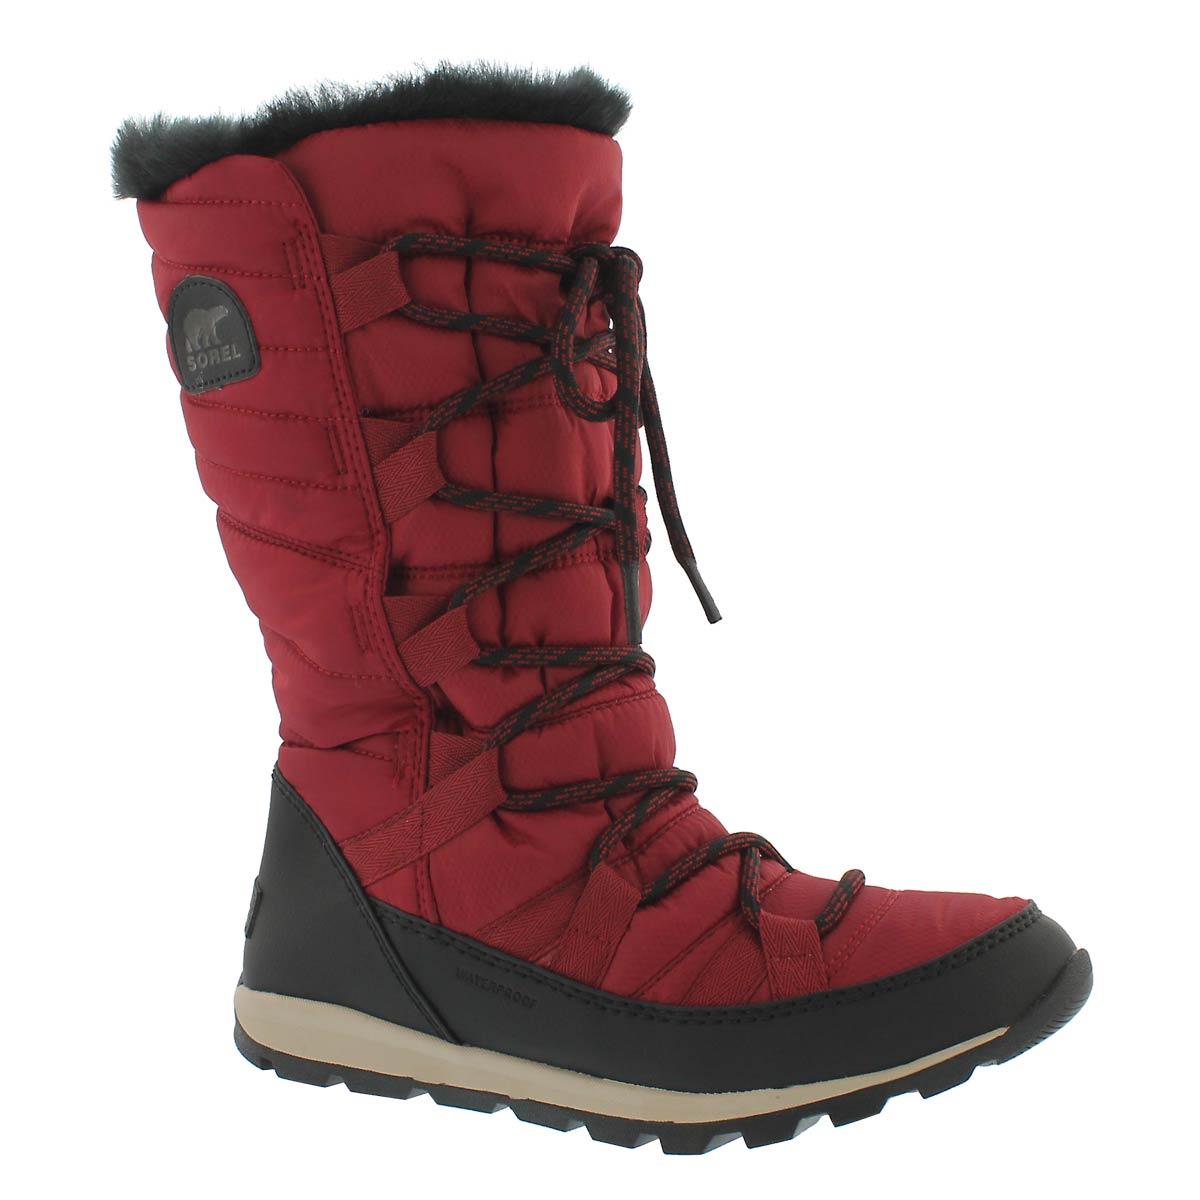 Women's WHITNEY LACE red waterproof winter boots